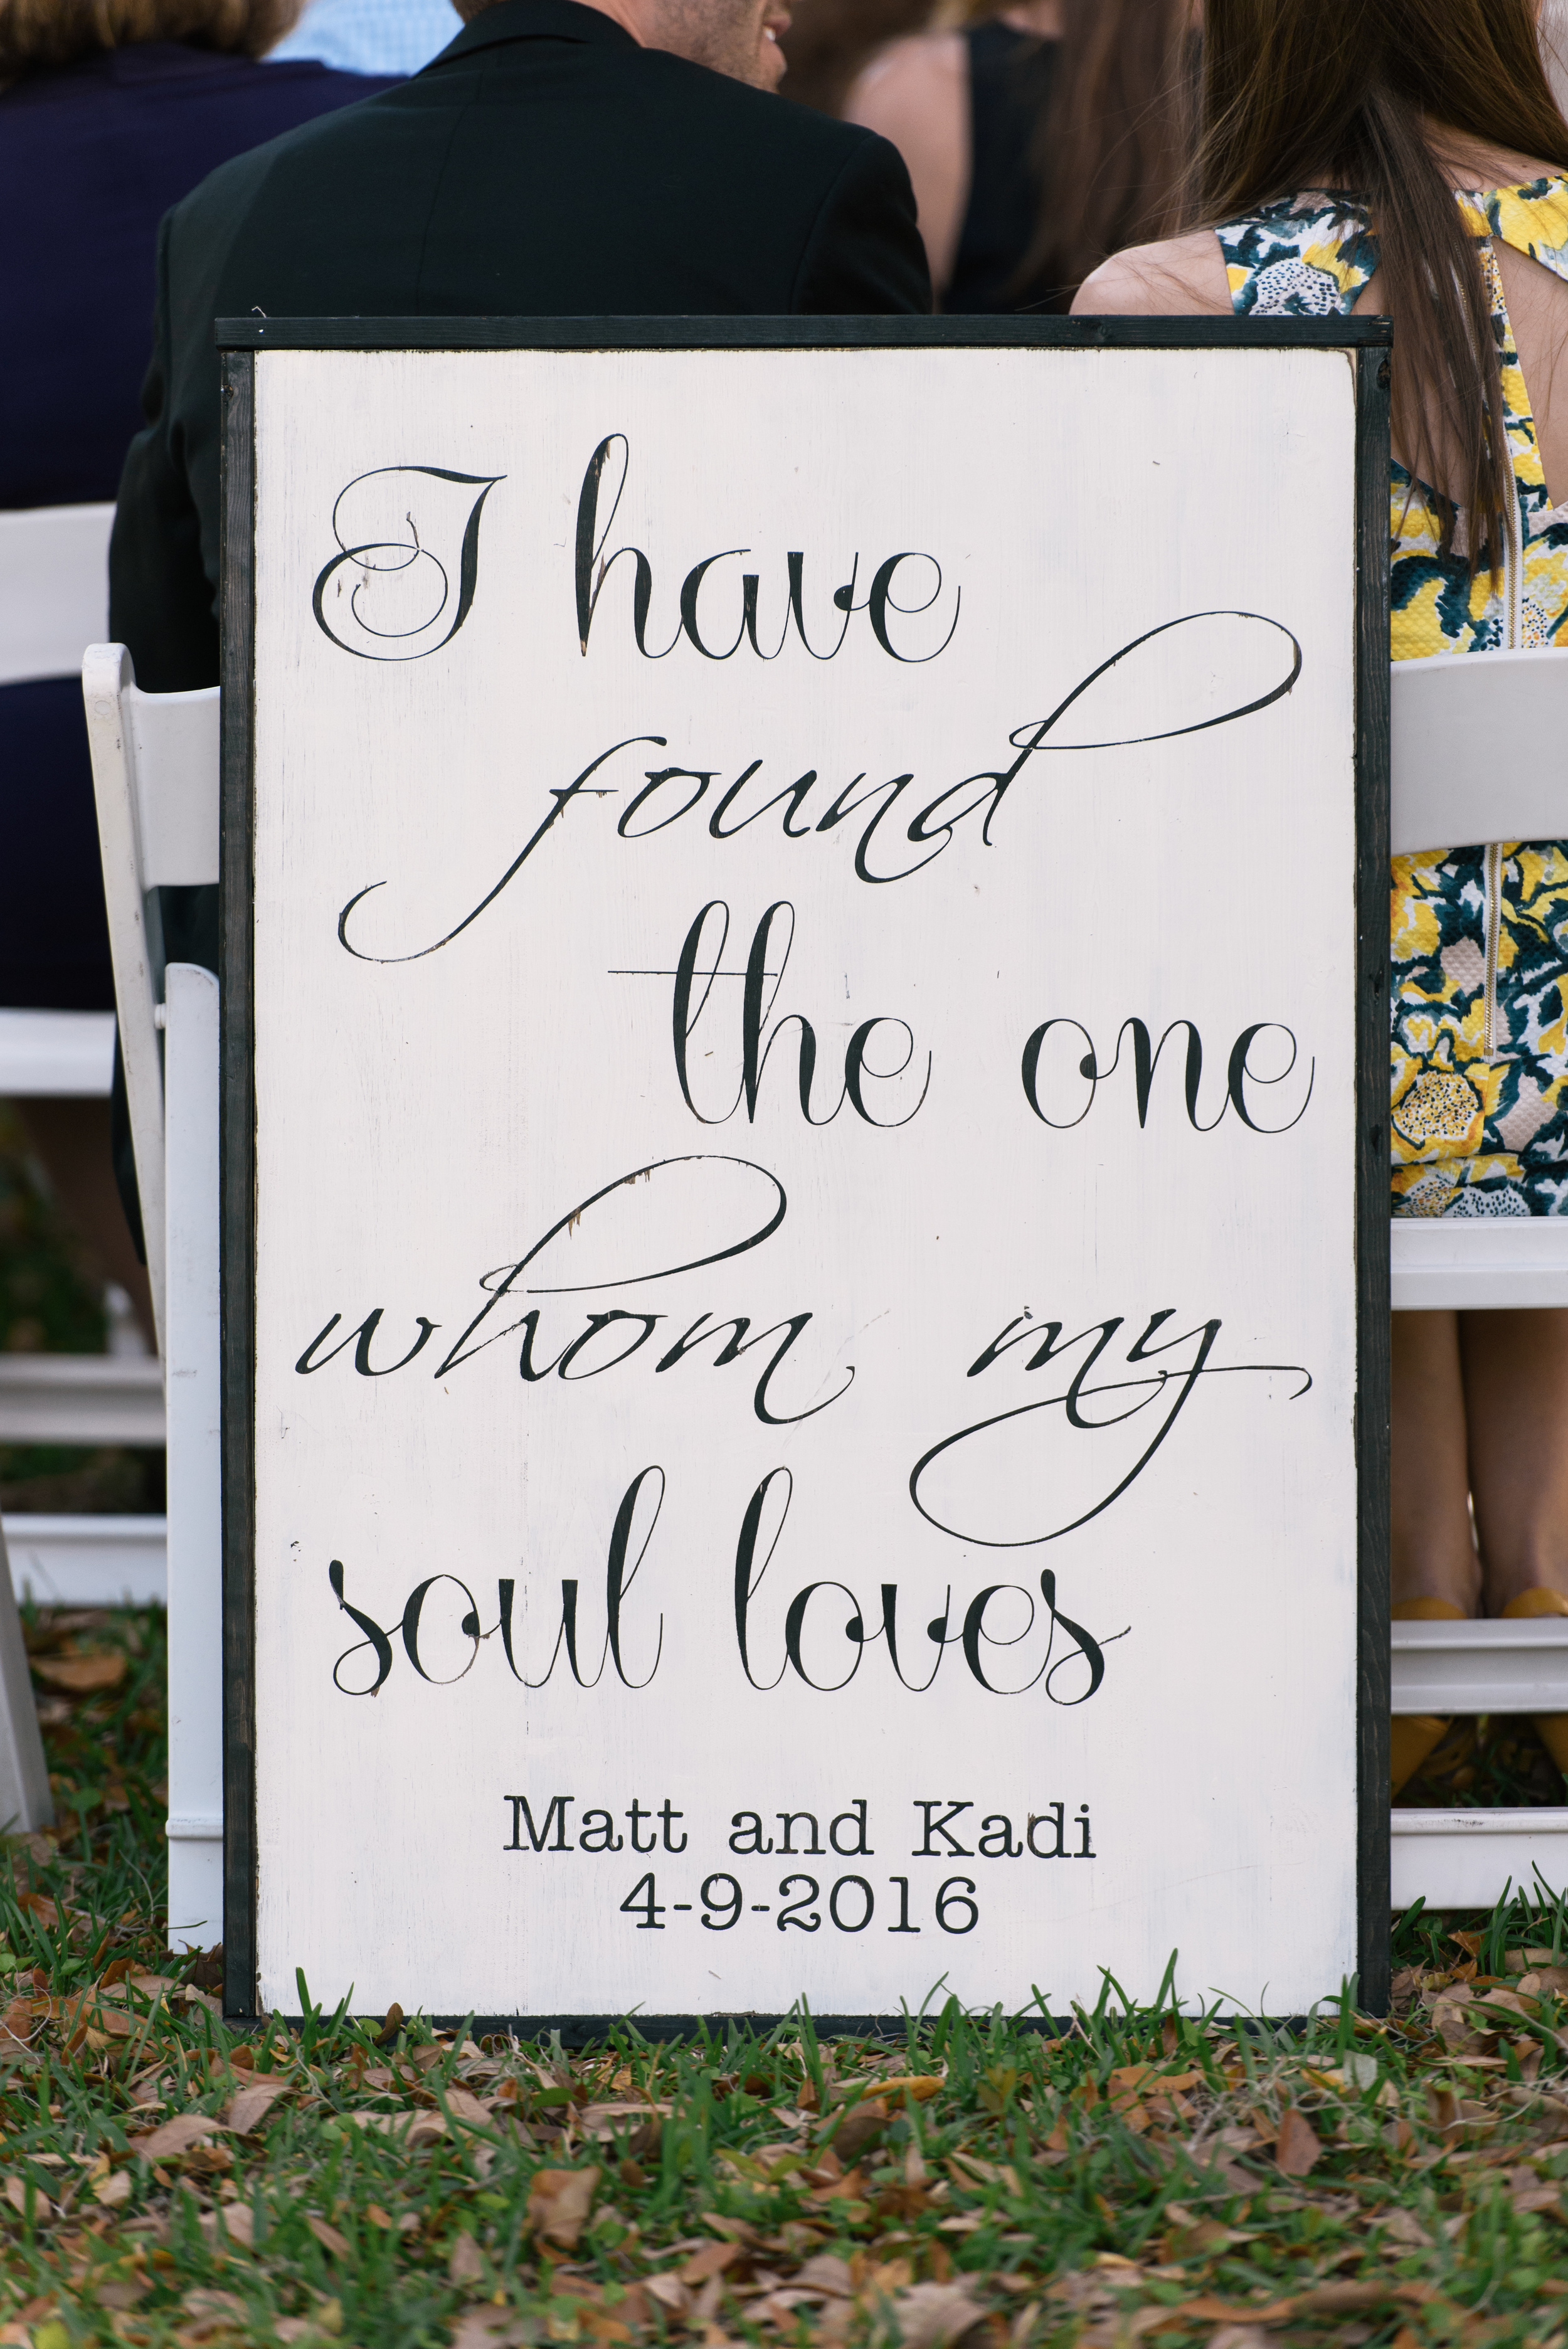 kadi-and-matt-carroll-april-9-2016-jekyl-island-wedding-m-newsom-photography- (167 of 484).jpg